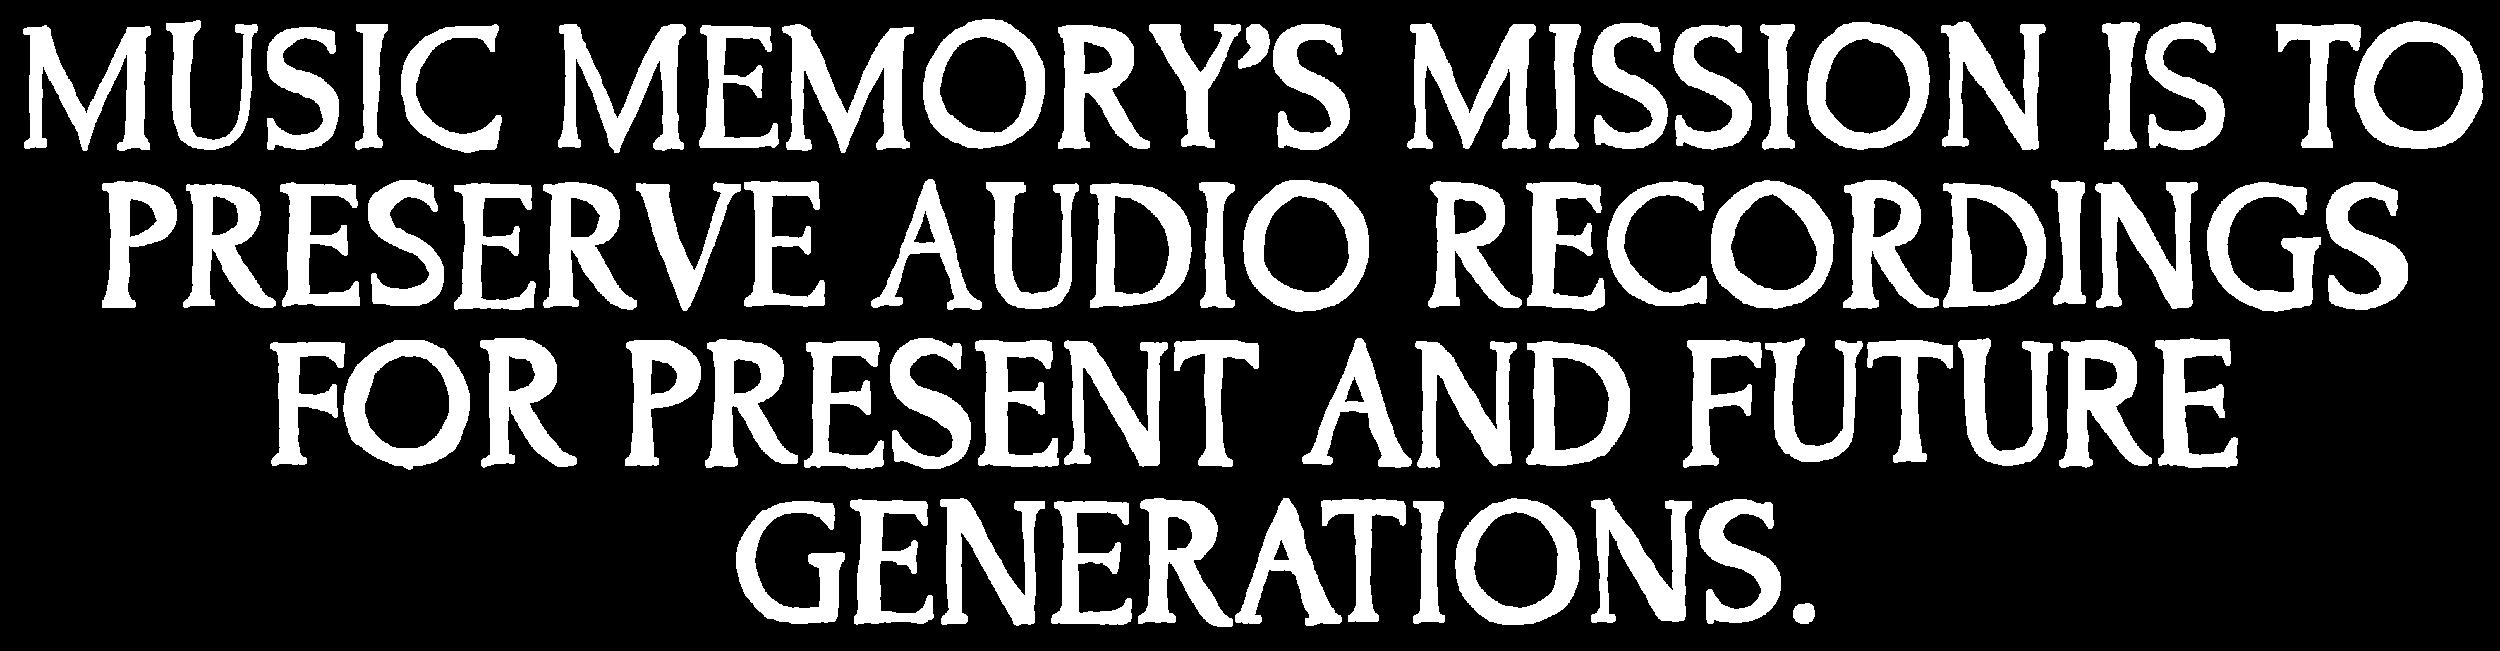 MM_Future_Generations.png